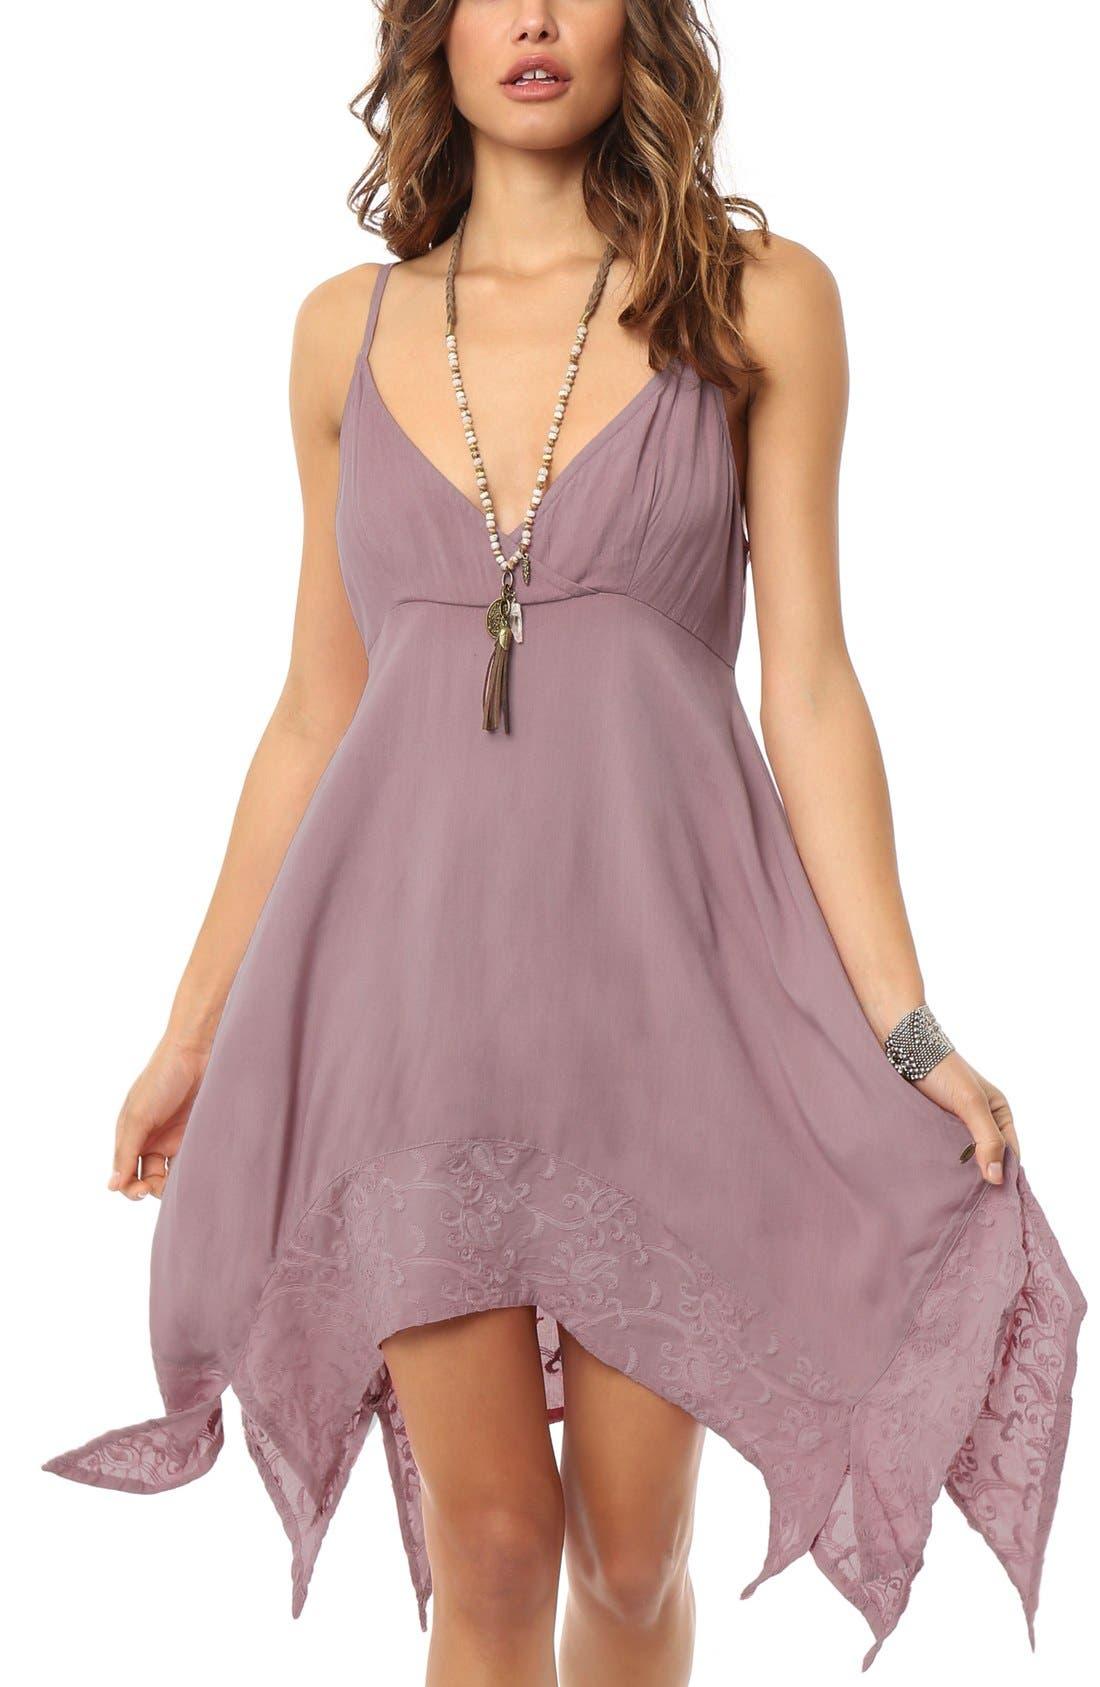 Main Image - O'Neill 'Jillian' Embroidered Dress